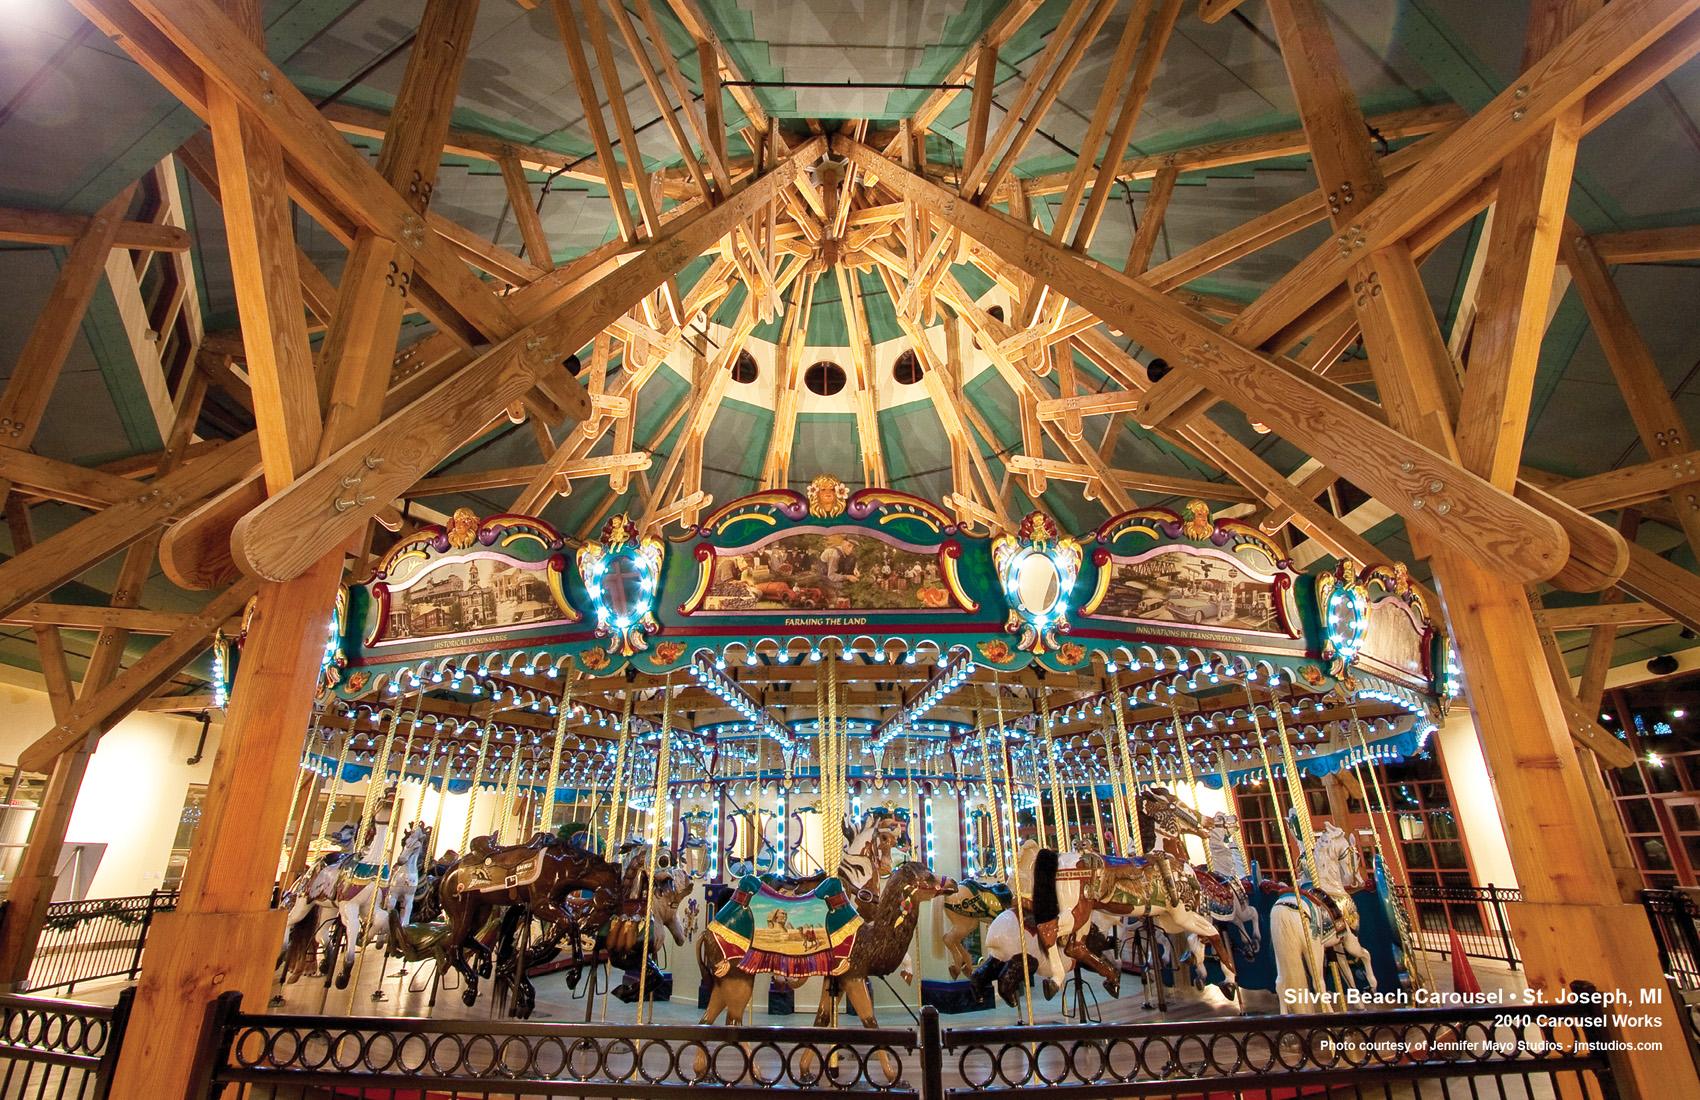 Silver-Beach-Carousel-St-Joseph-MI-CNT_MAR_10